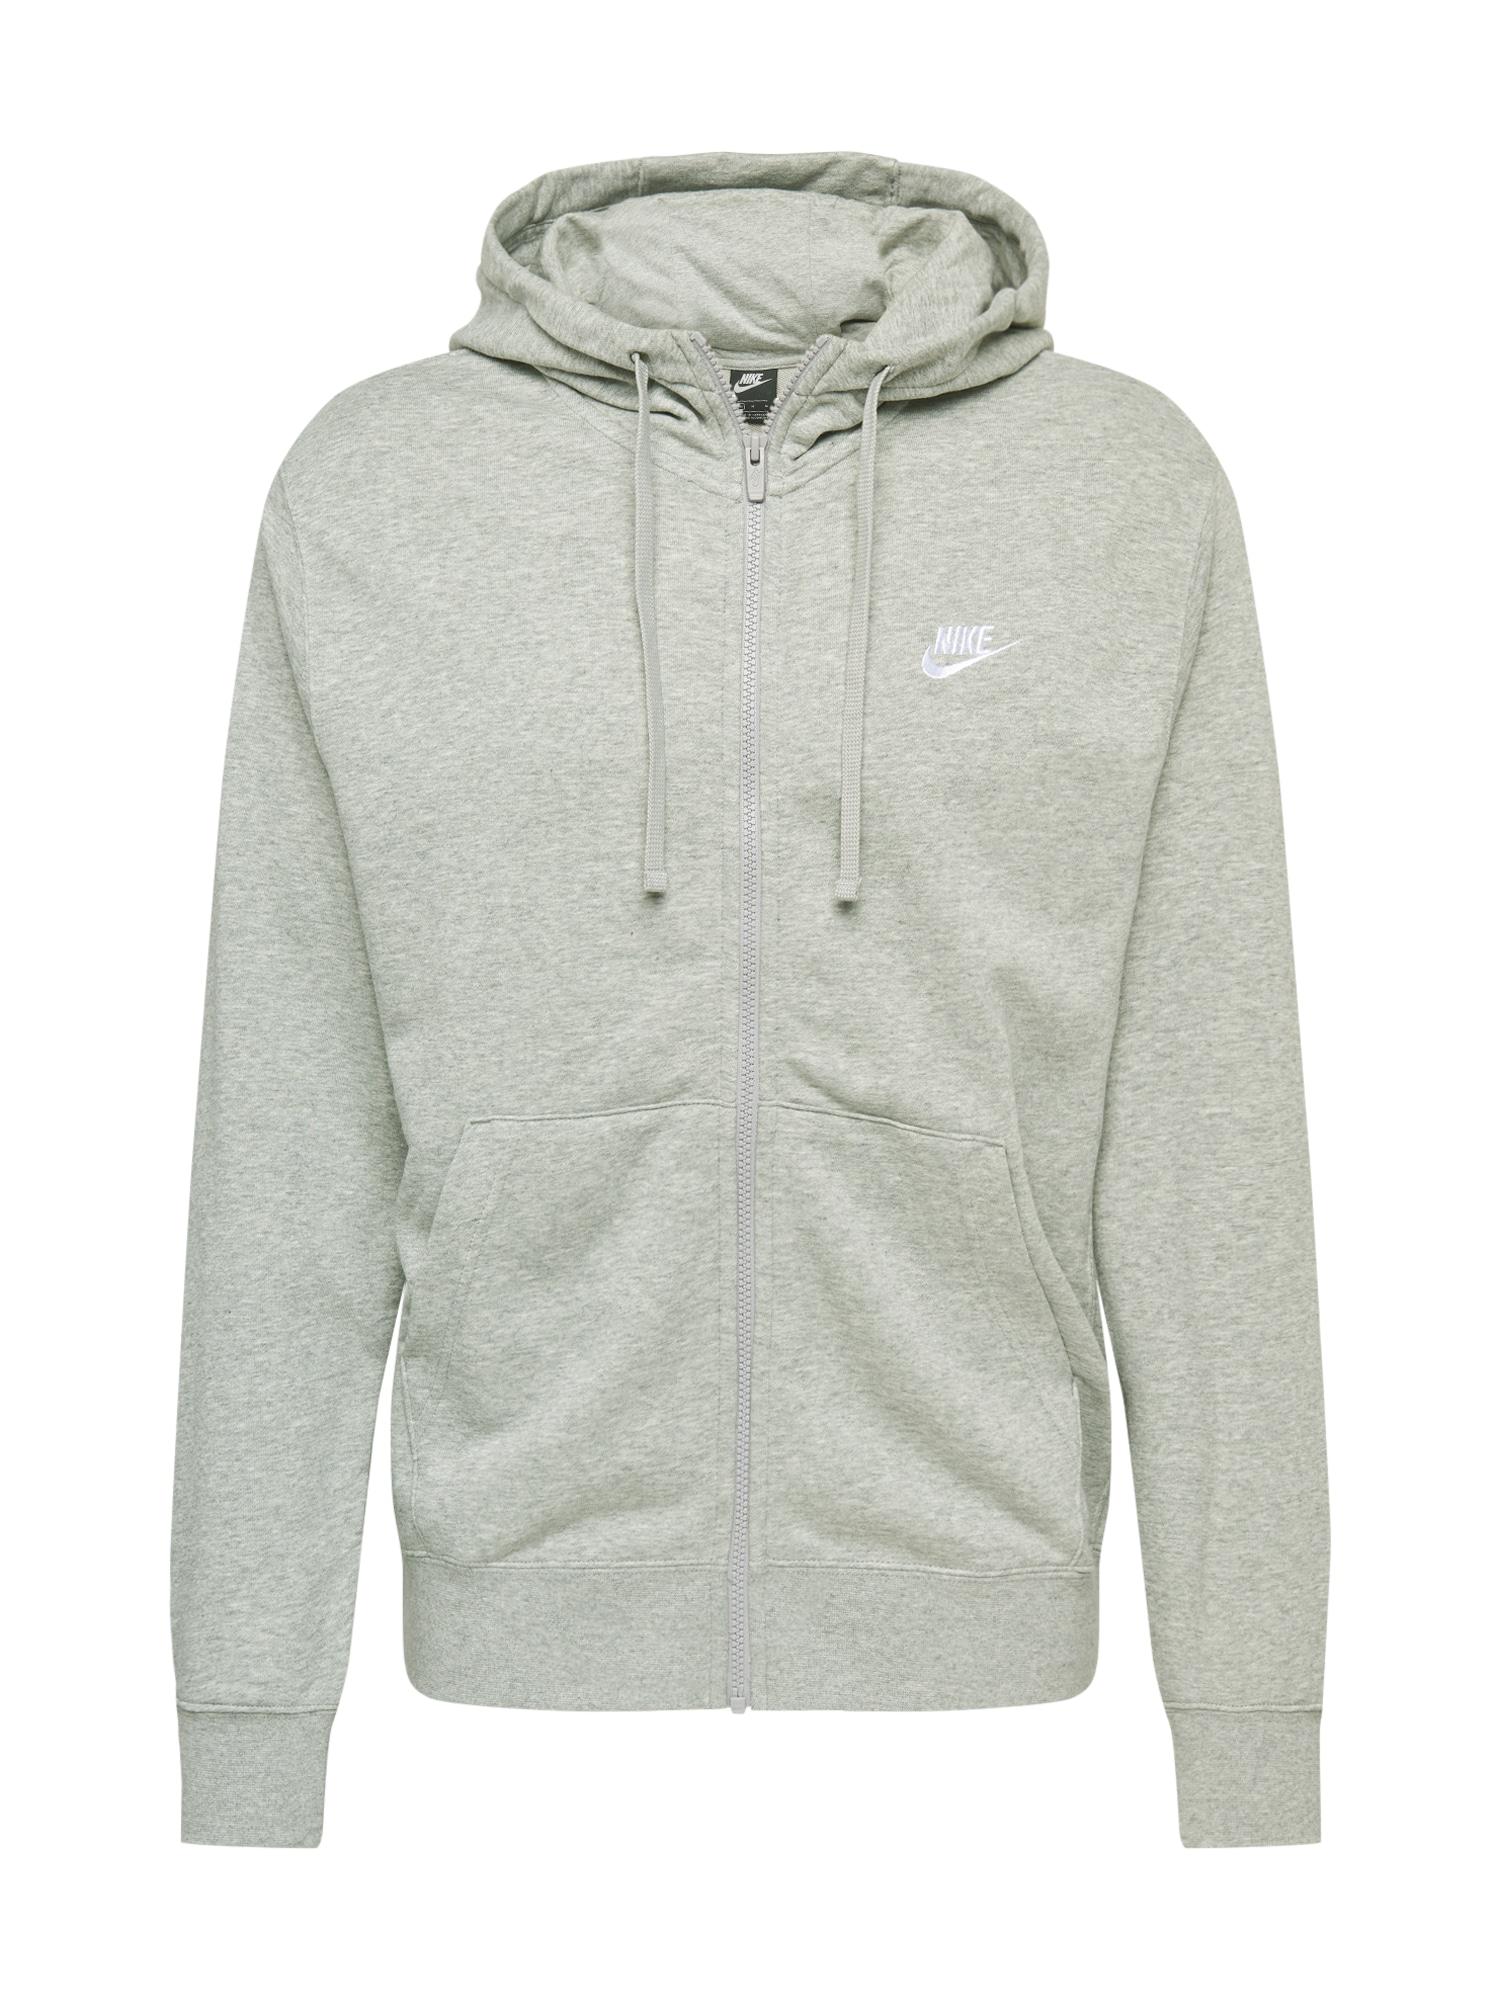 Nike Sportswear Džemperis pilka